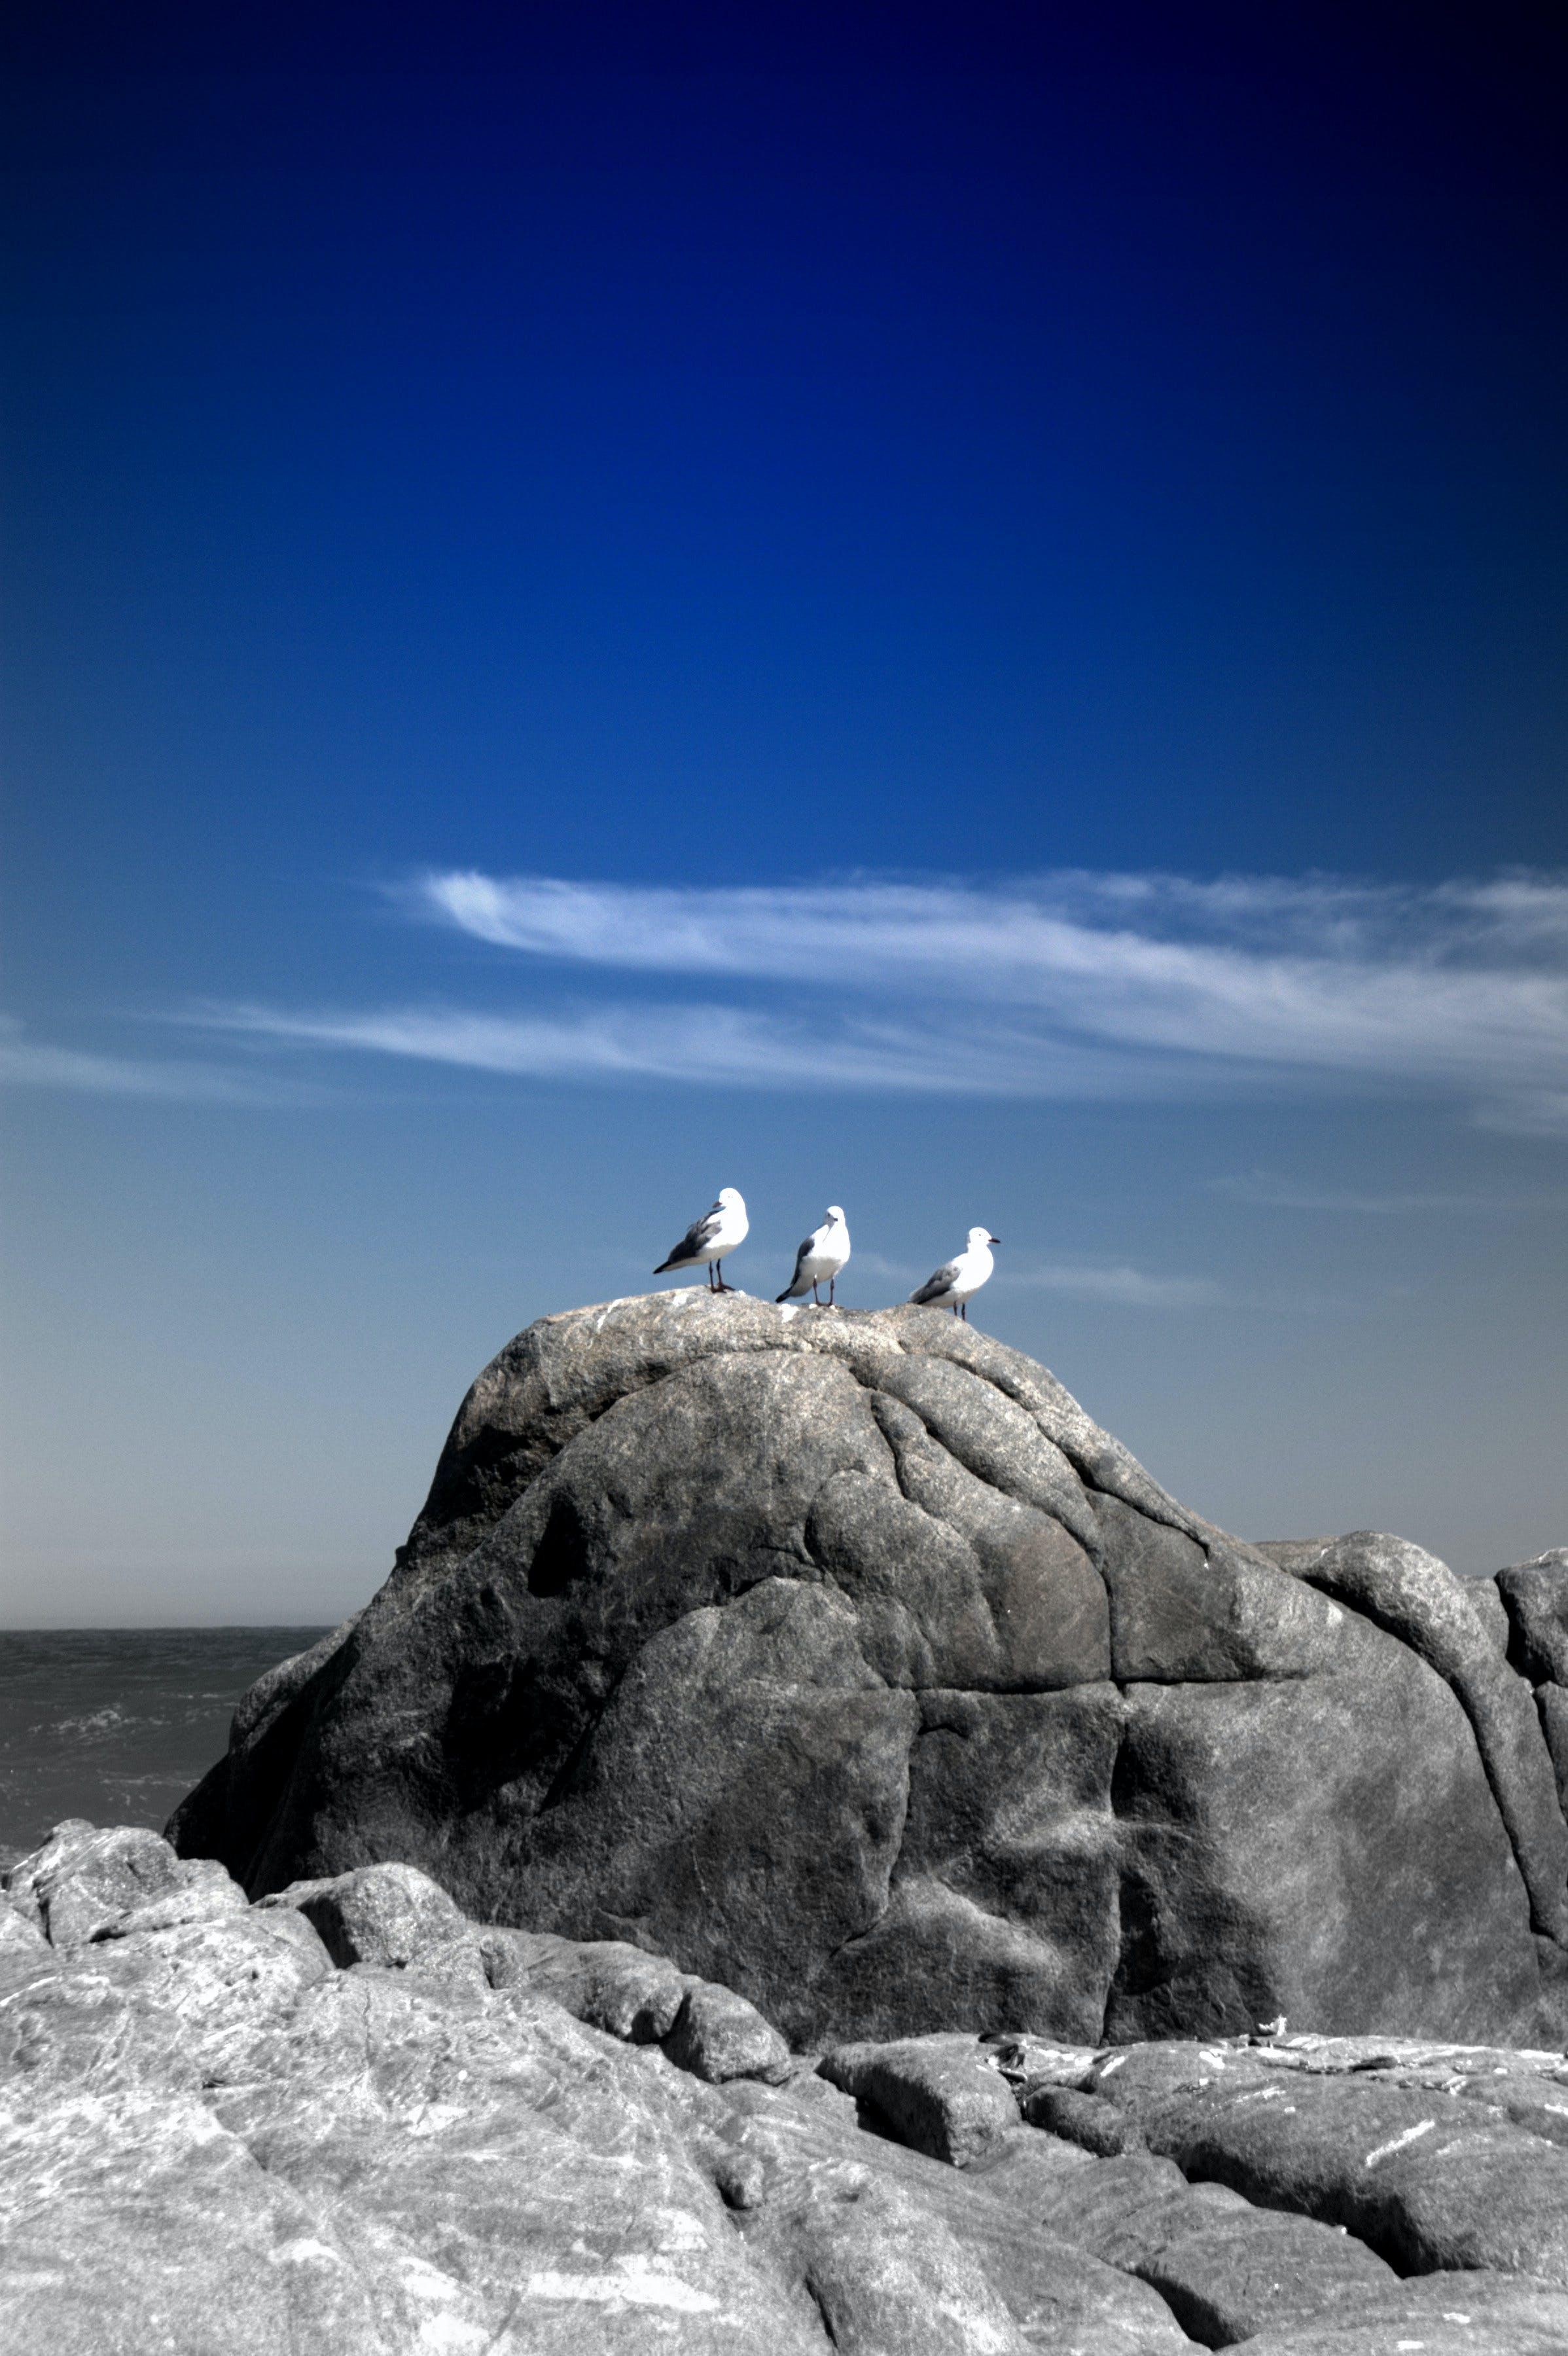 Three White Birds on Rock